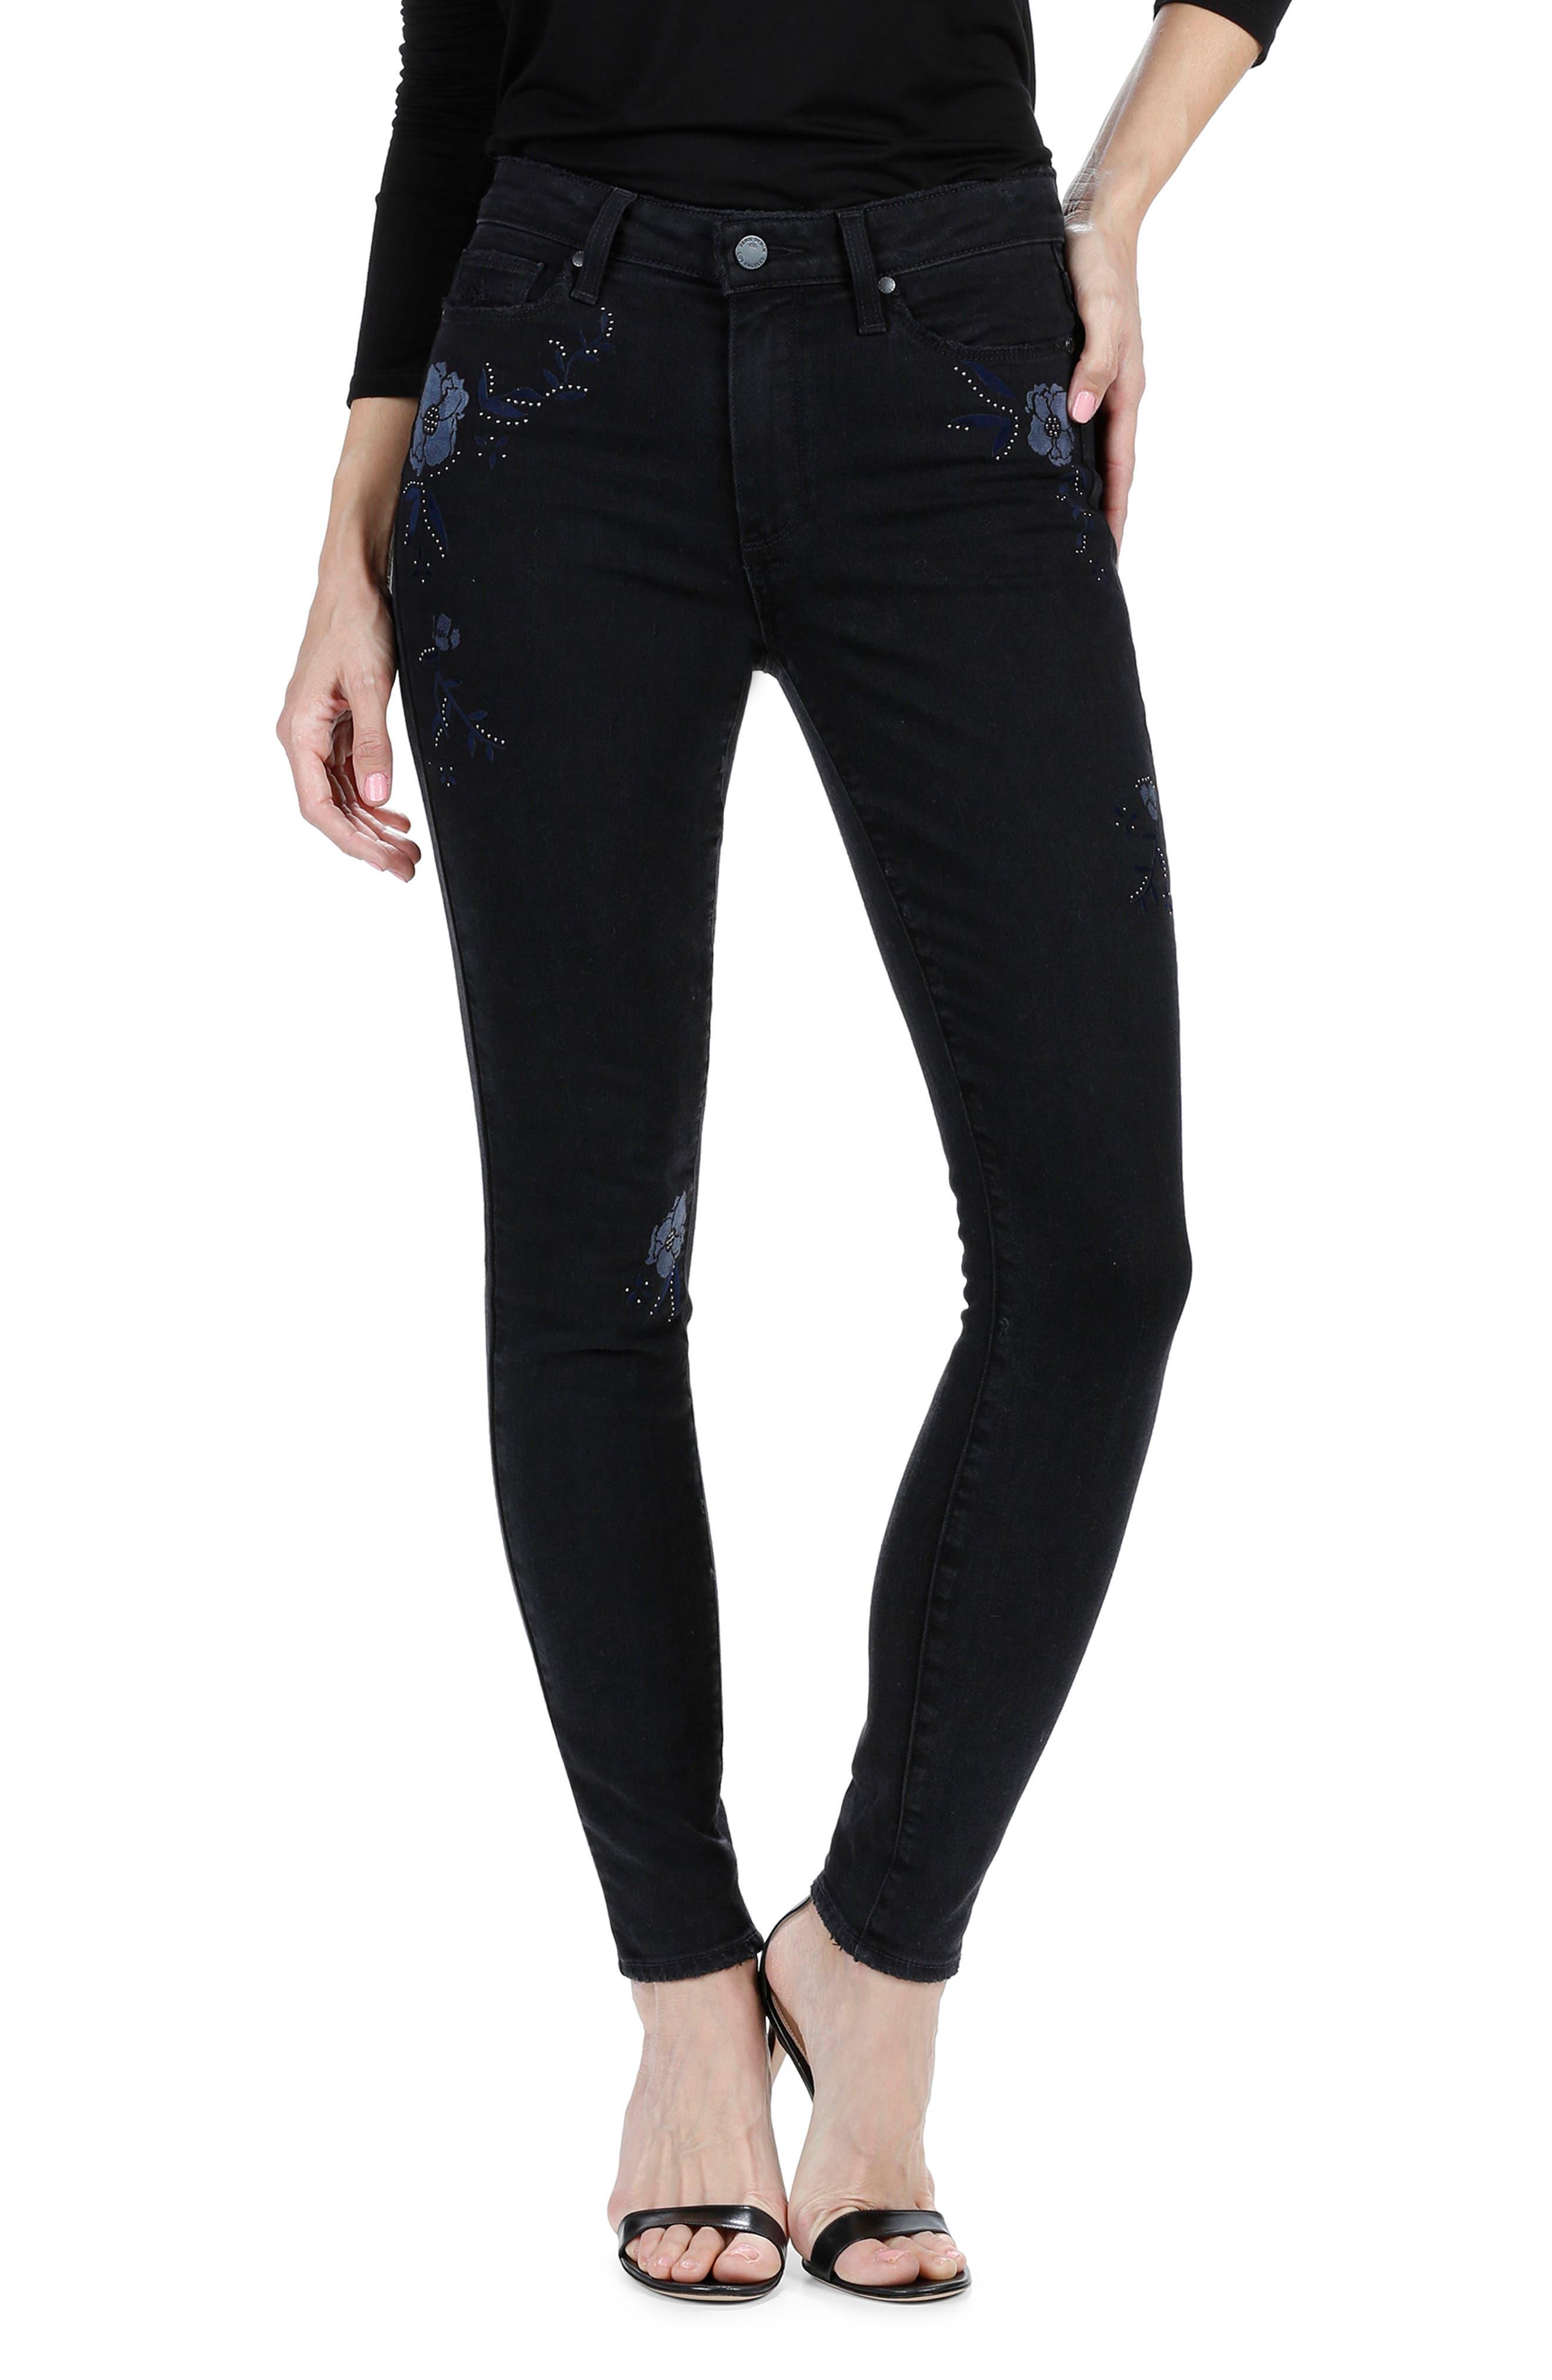 Main Image - PAIGE Hoxton High Waist Ultra Skinny Jeans (Floral Noir)